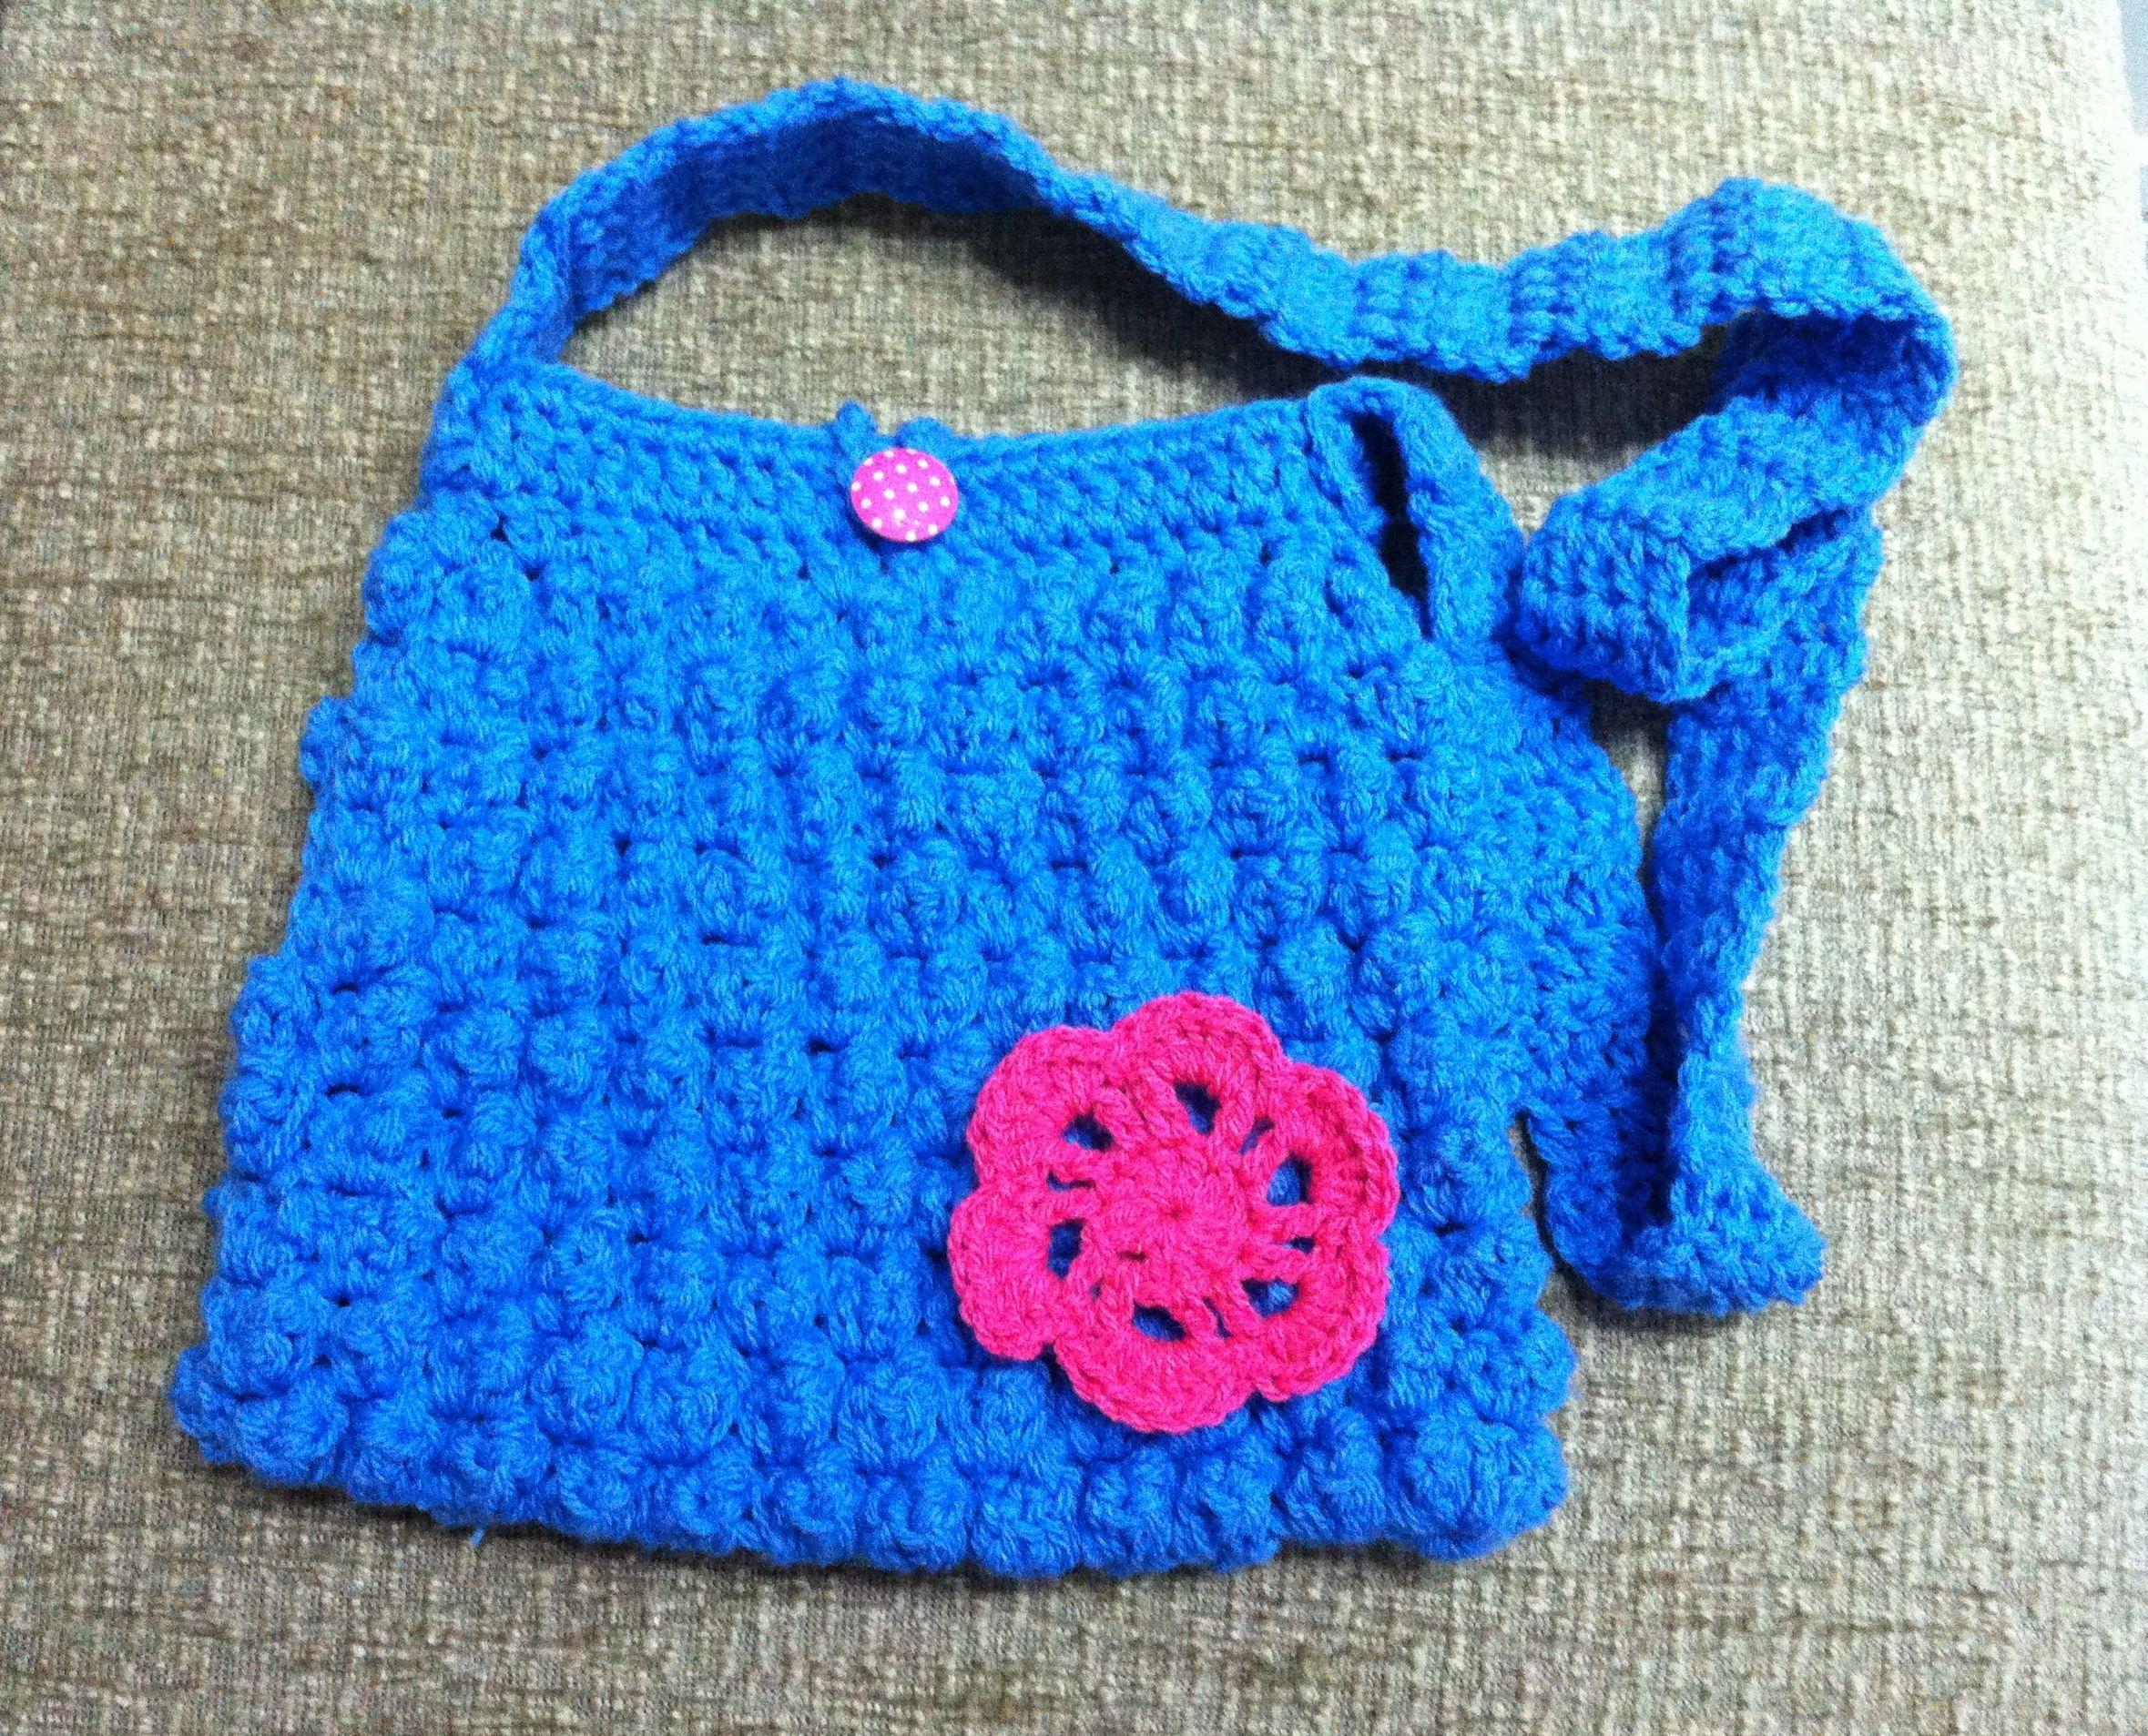 Shoulder Bag Crochet : Crochet Shoulder Bag Purses and Bags Pinterest